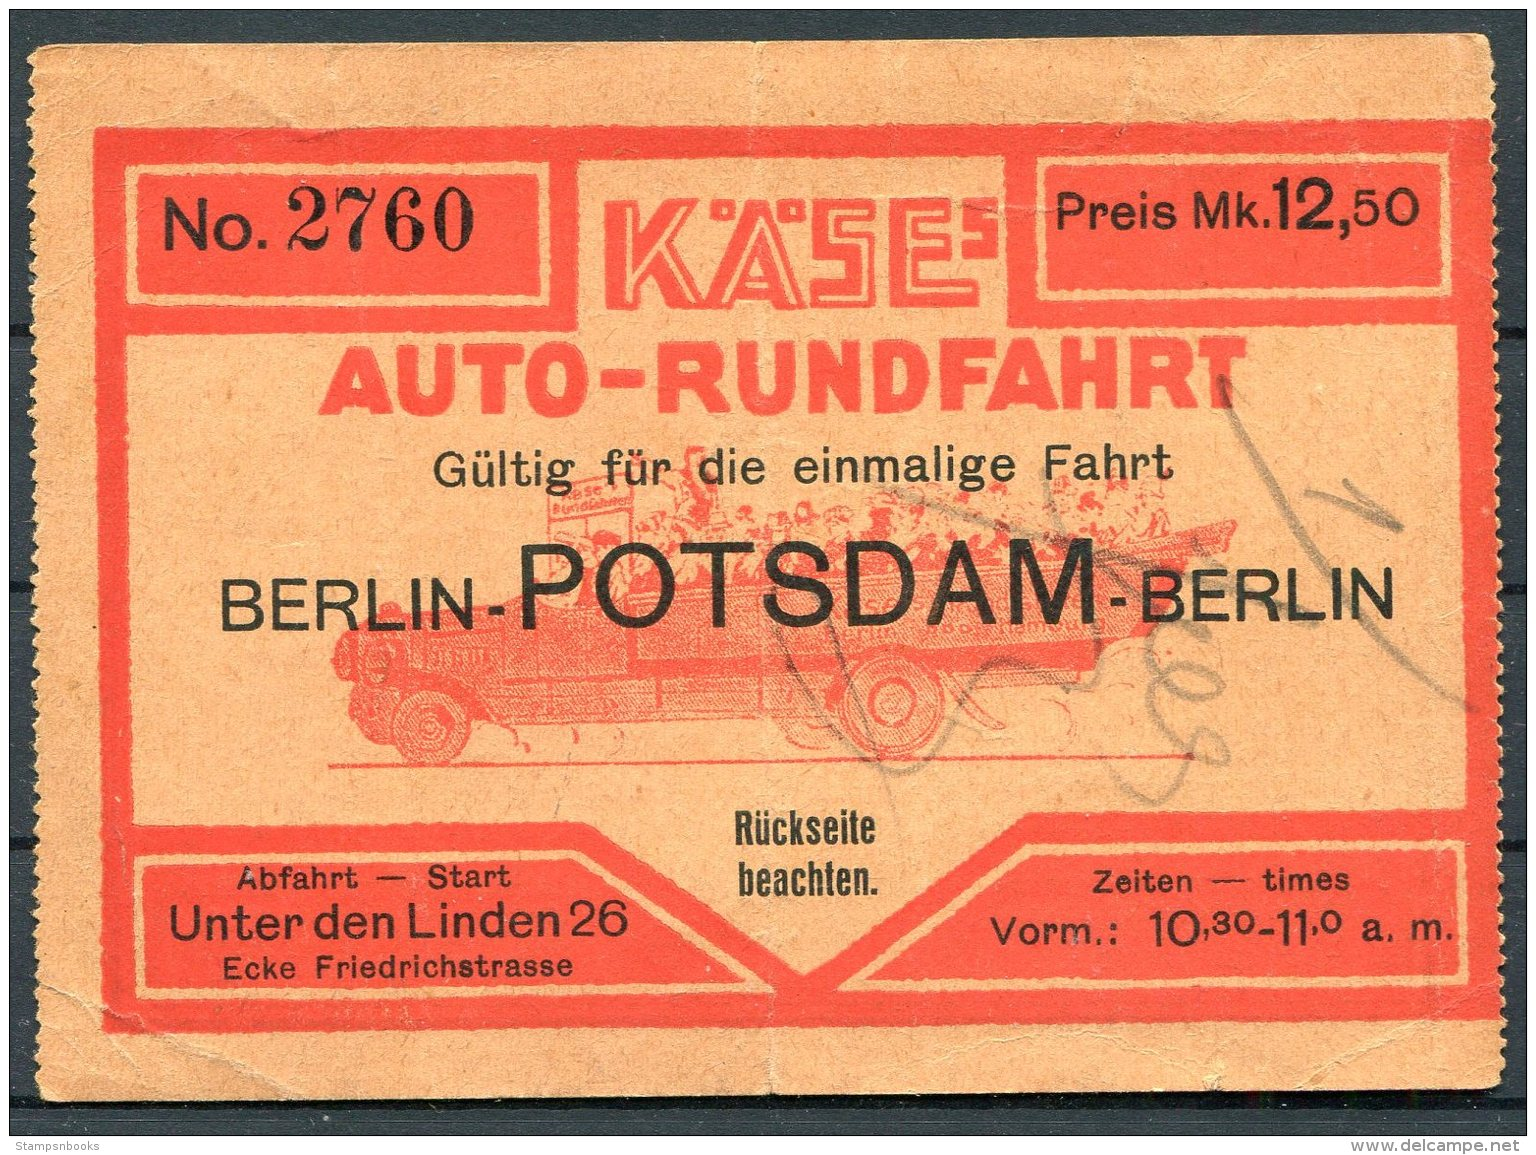 Germany Berlin - Potsdam - Berlin Auto-Rundfahrten, Thomas Cook & Son Ticket - Transportation